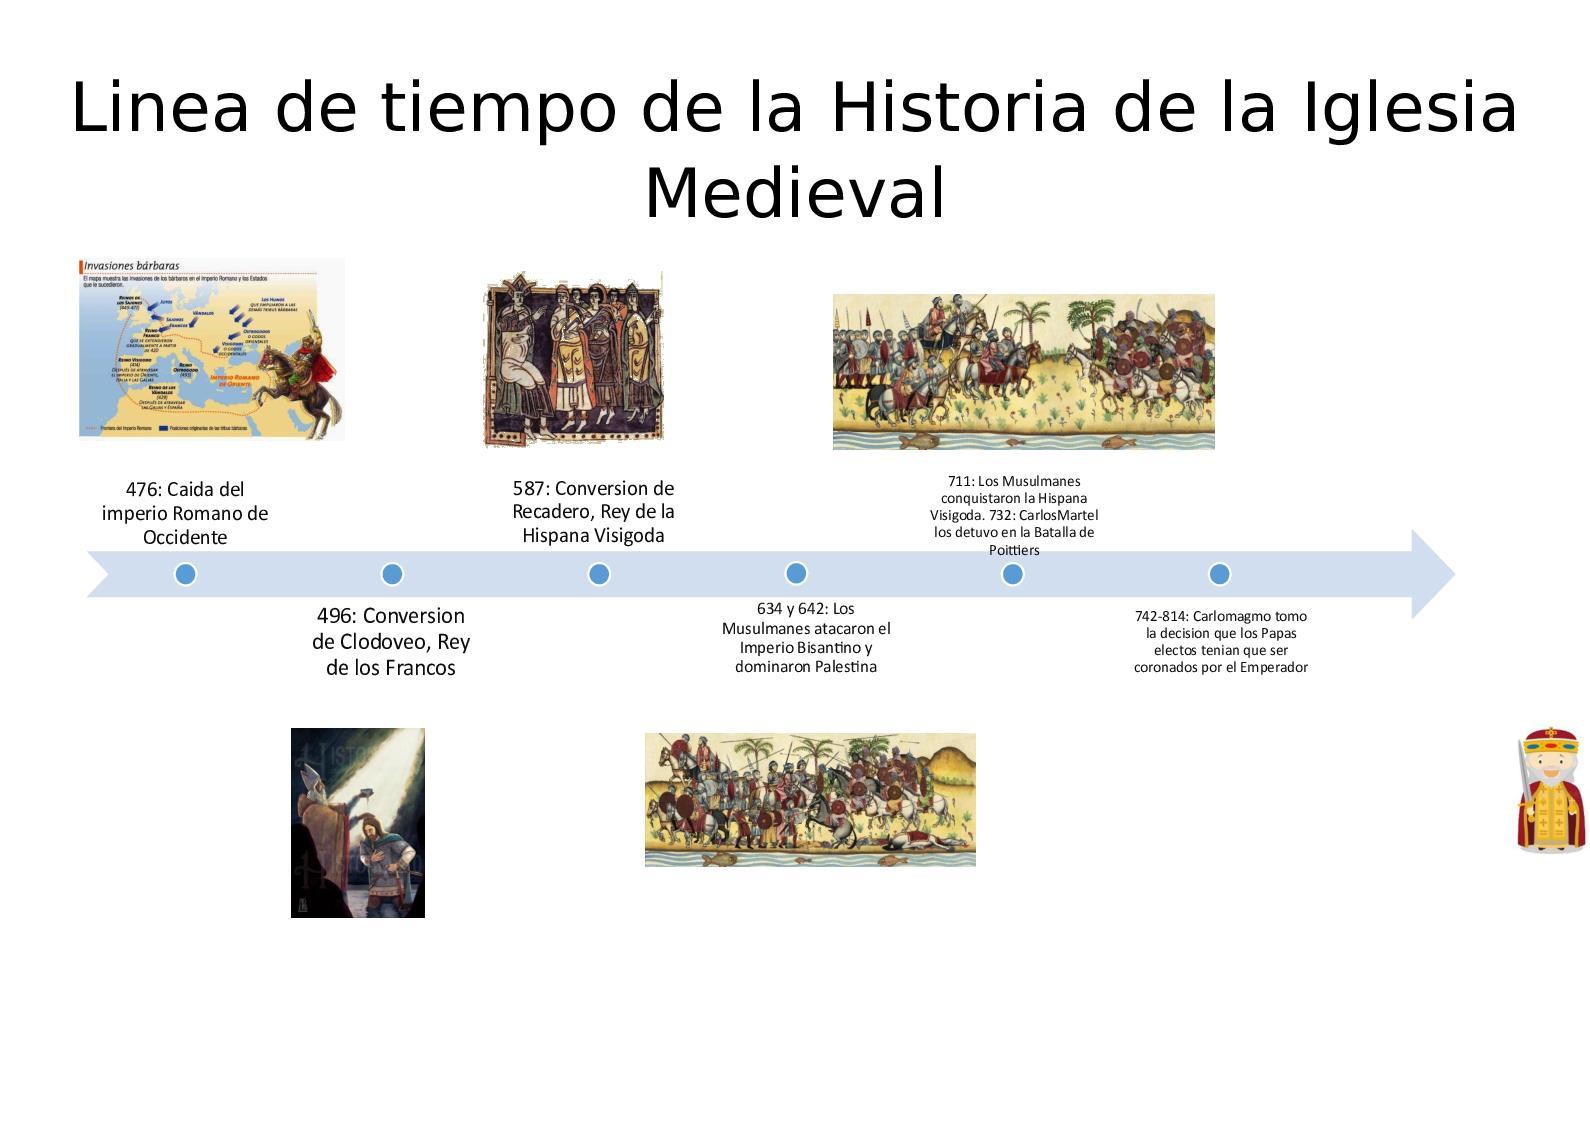 Linea De Tiempo De La Historia De La Iglesia Medieval